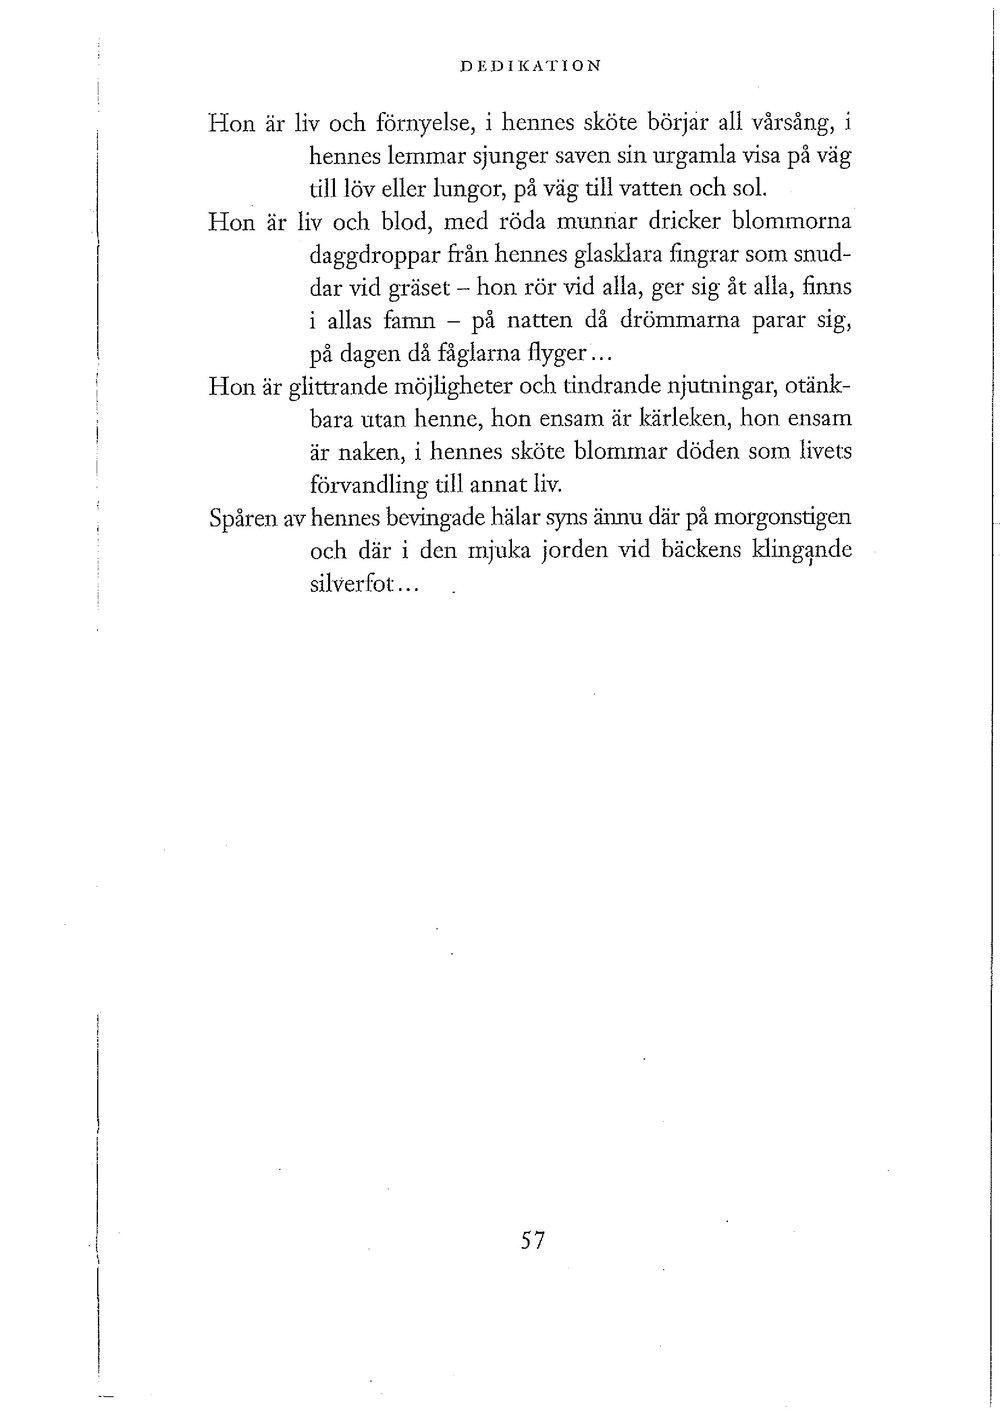 Ljung-page-004.jpg